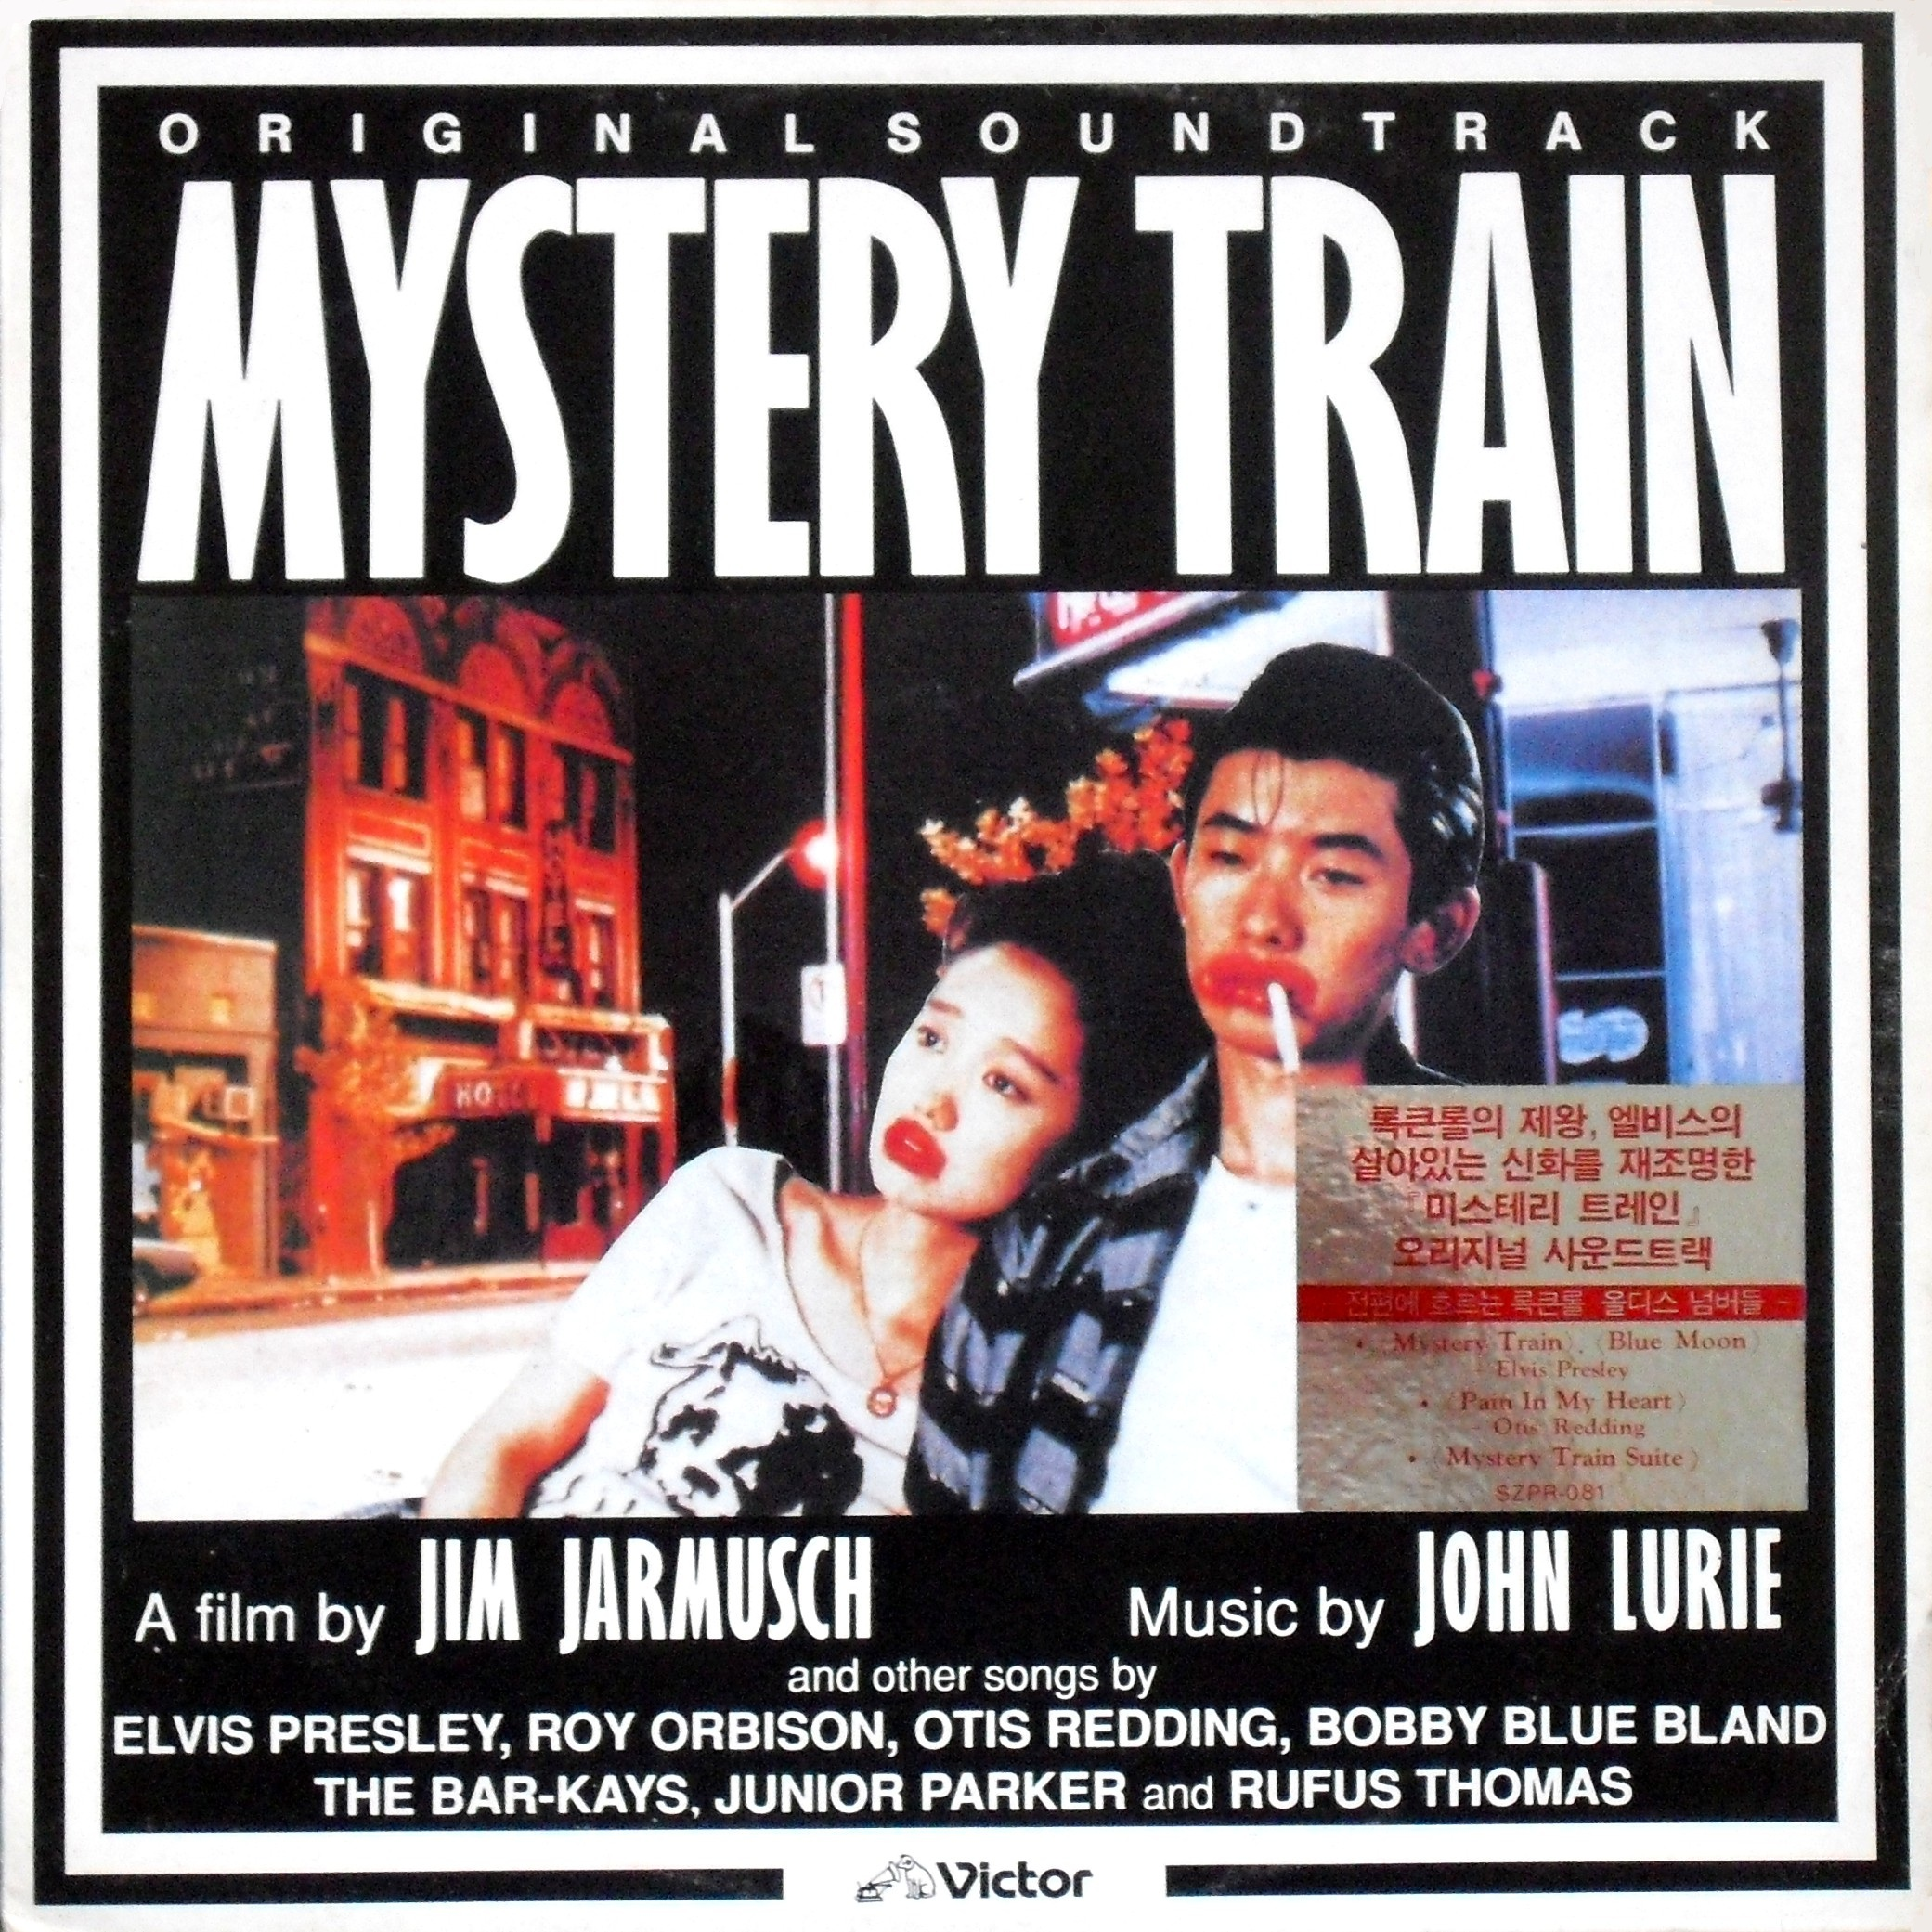 MYSTERY TRAIN 01osuyj